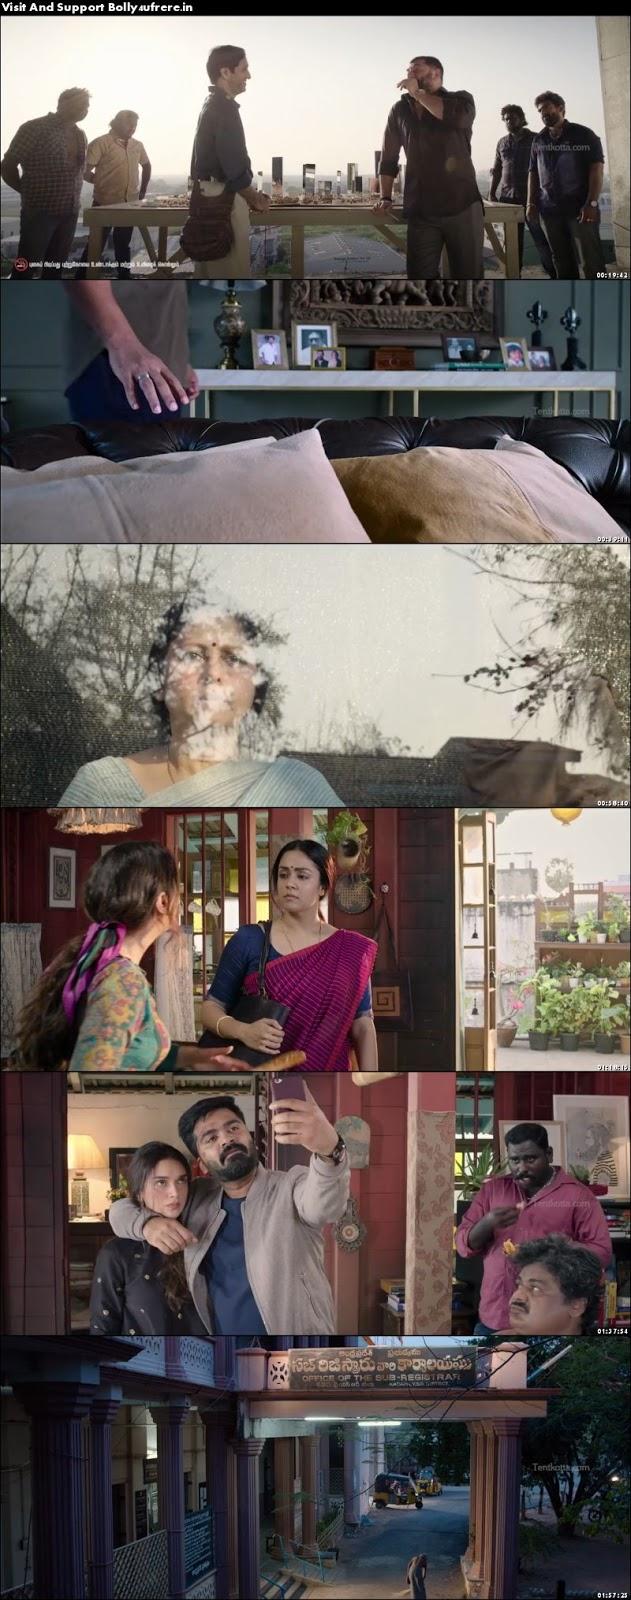 Chekka Chivantha Vaanam 2018 Hindi Dual Audio HDRip UNCUT 1.1GB 720p